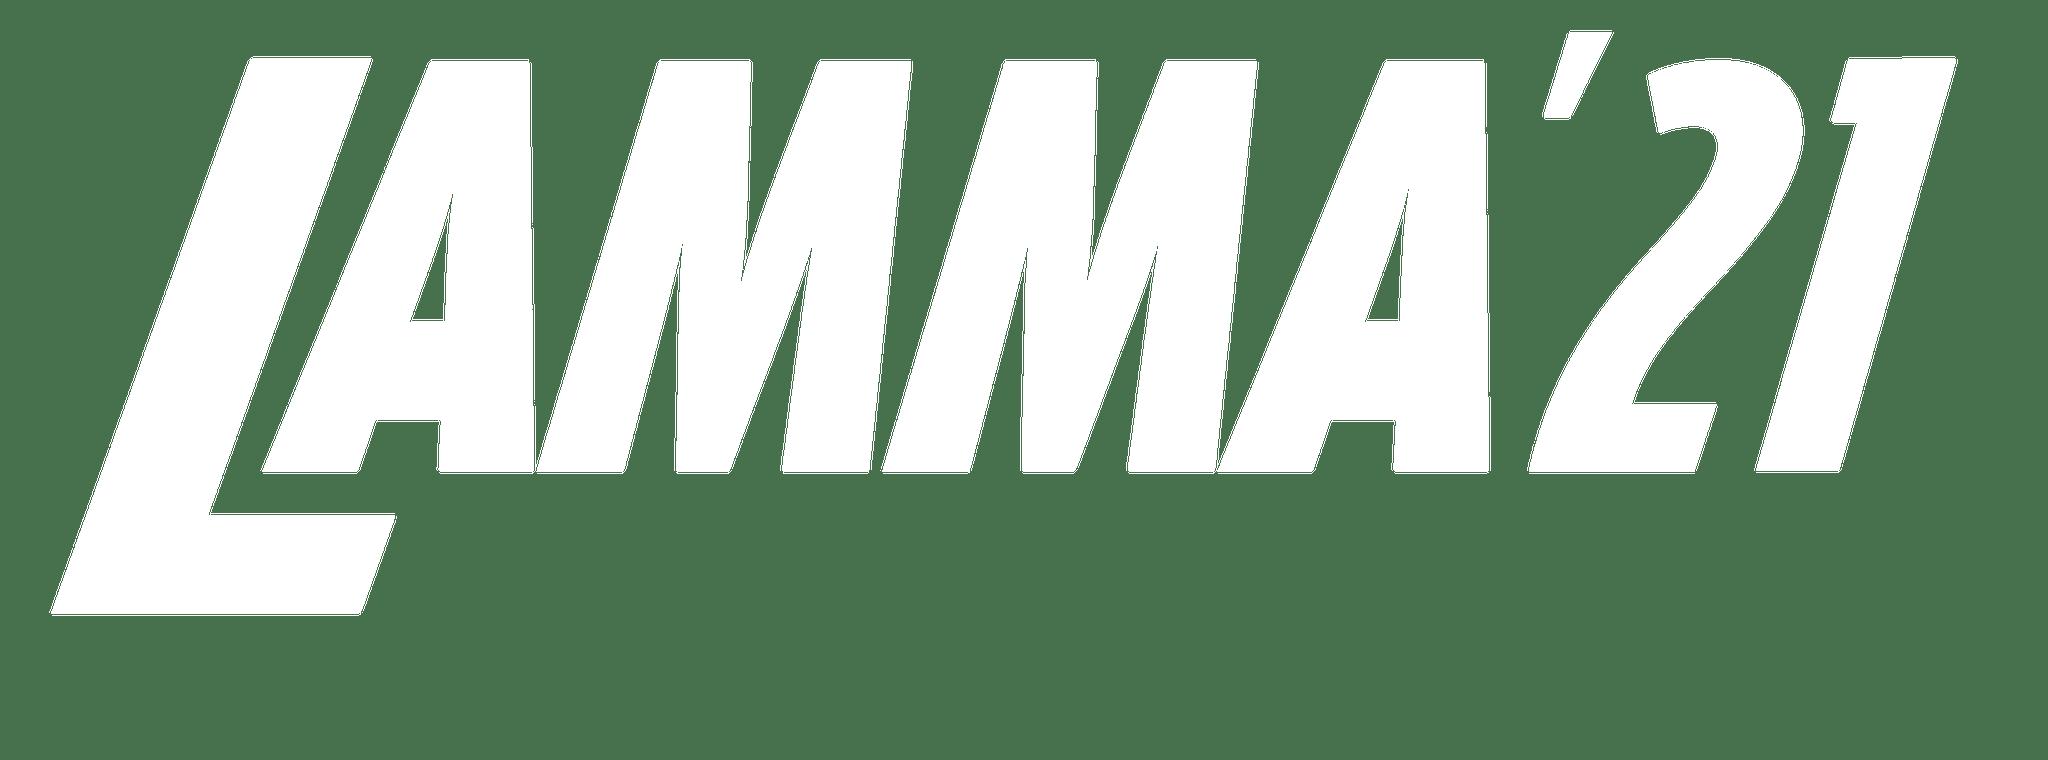 LAMMA 2021 Logo